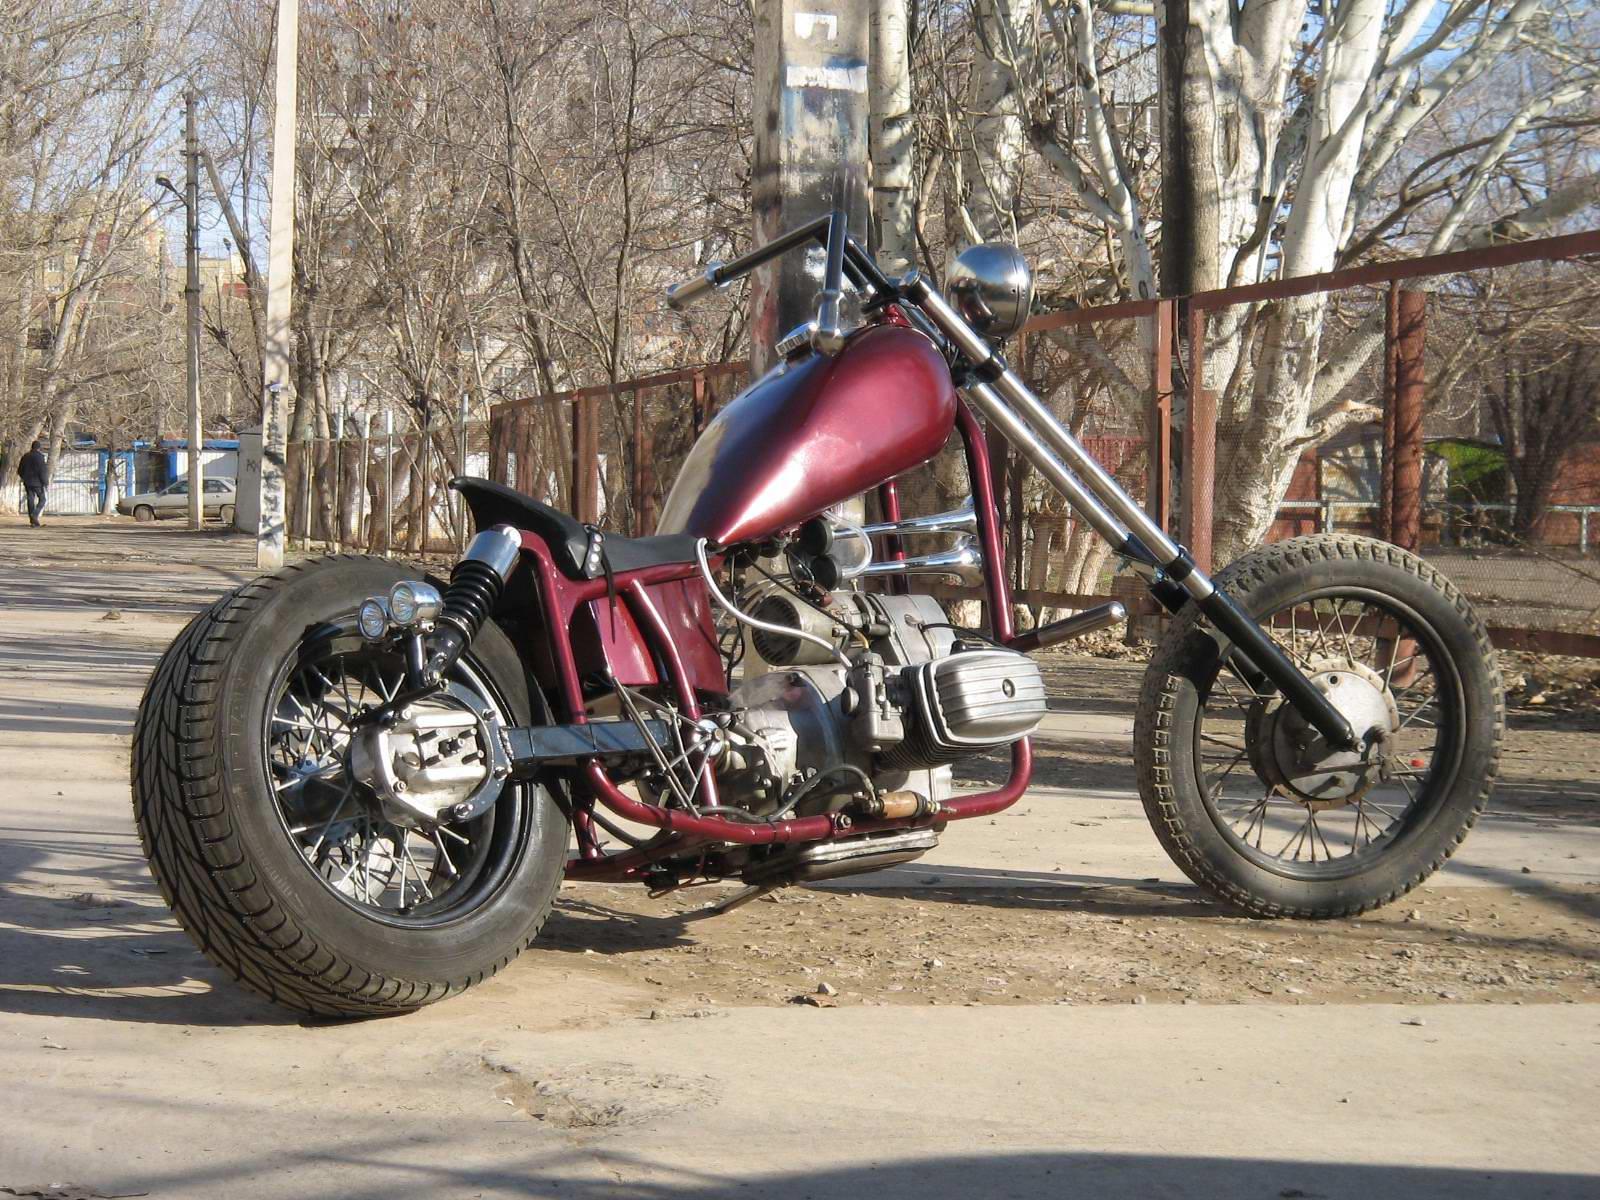 Моё заднее широкое колесо OPPOZIT.RU мотоциклы Урал, Днепр, BMW ремонт мотоциклов